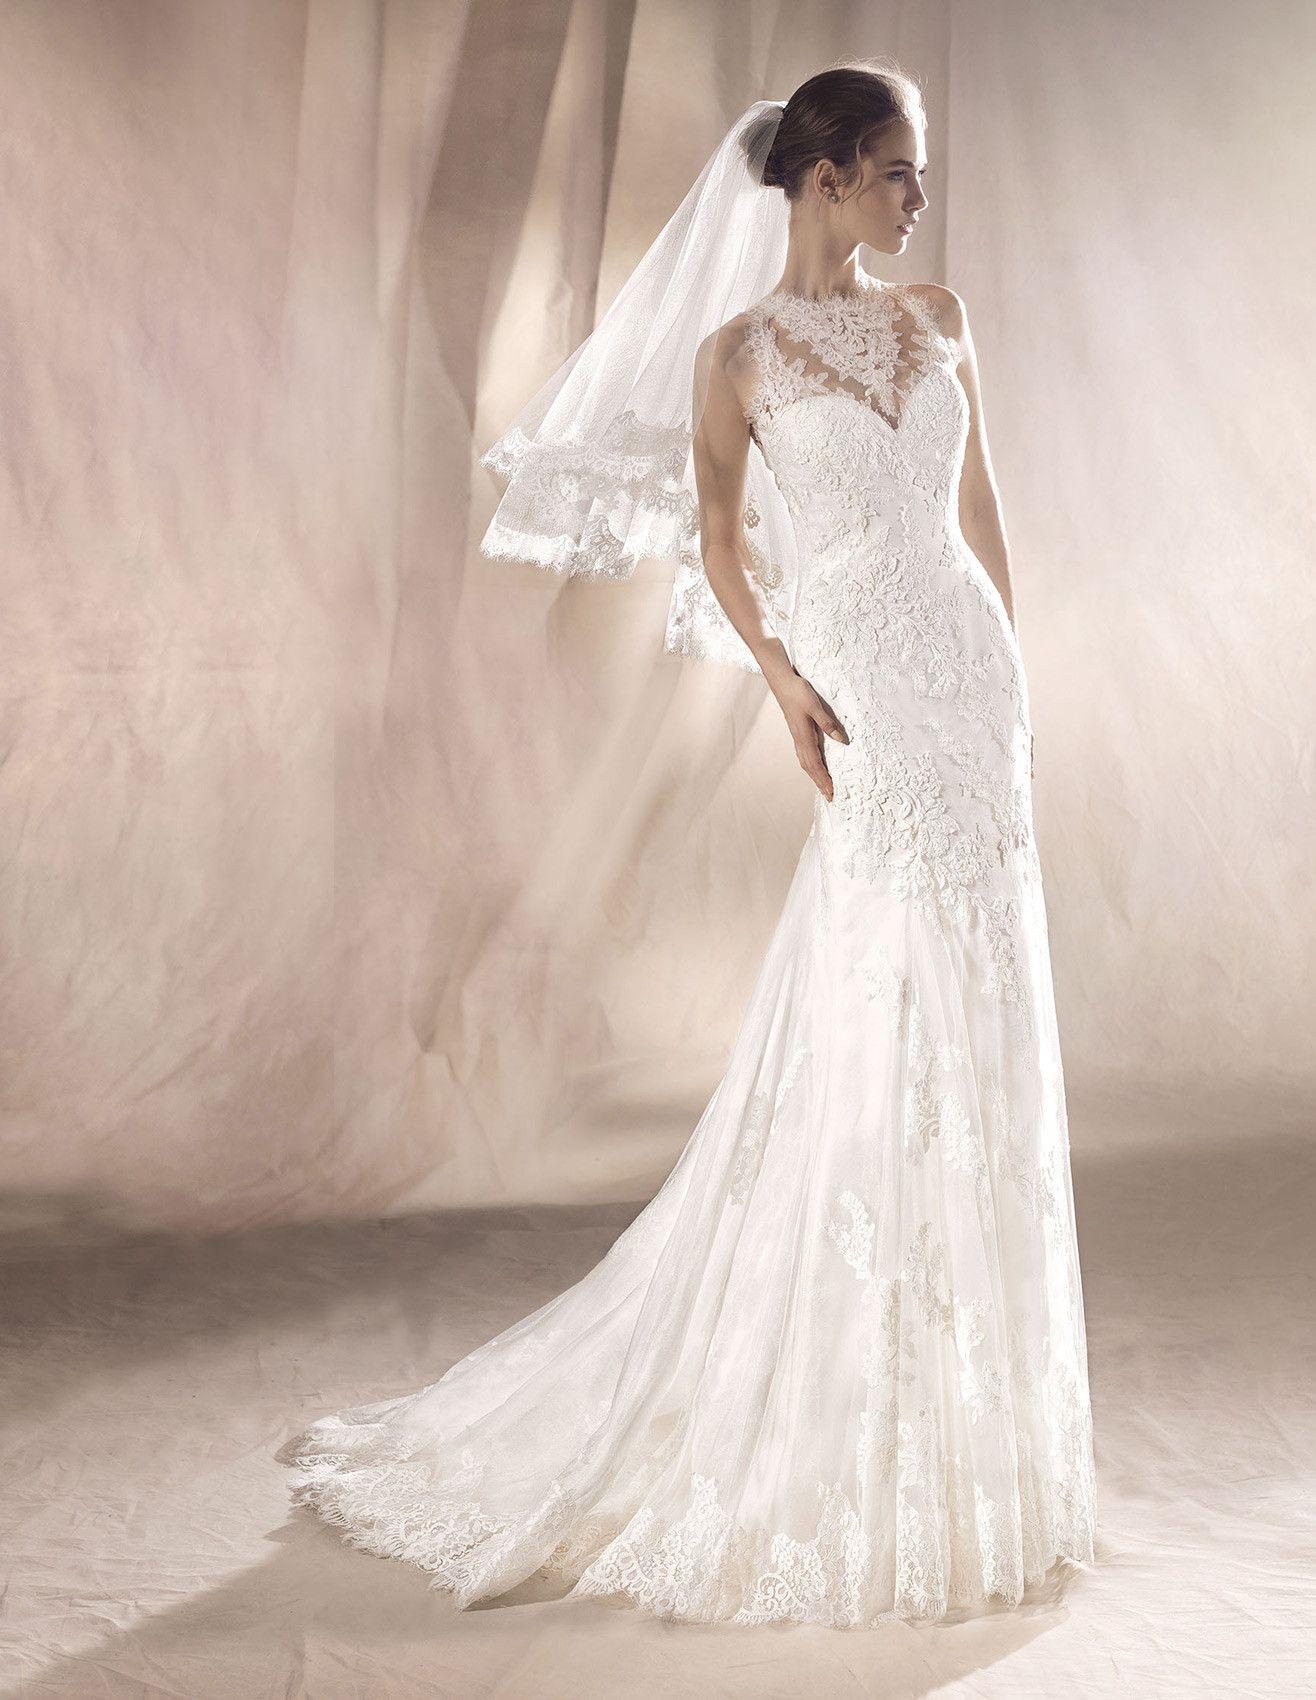 50f0ec6333 White One by Pronovias is at Alicia s Bridal